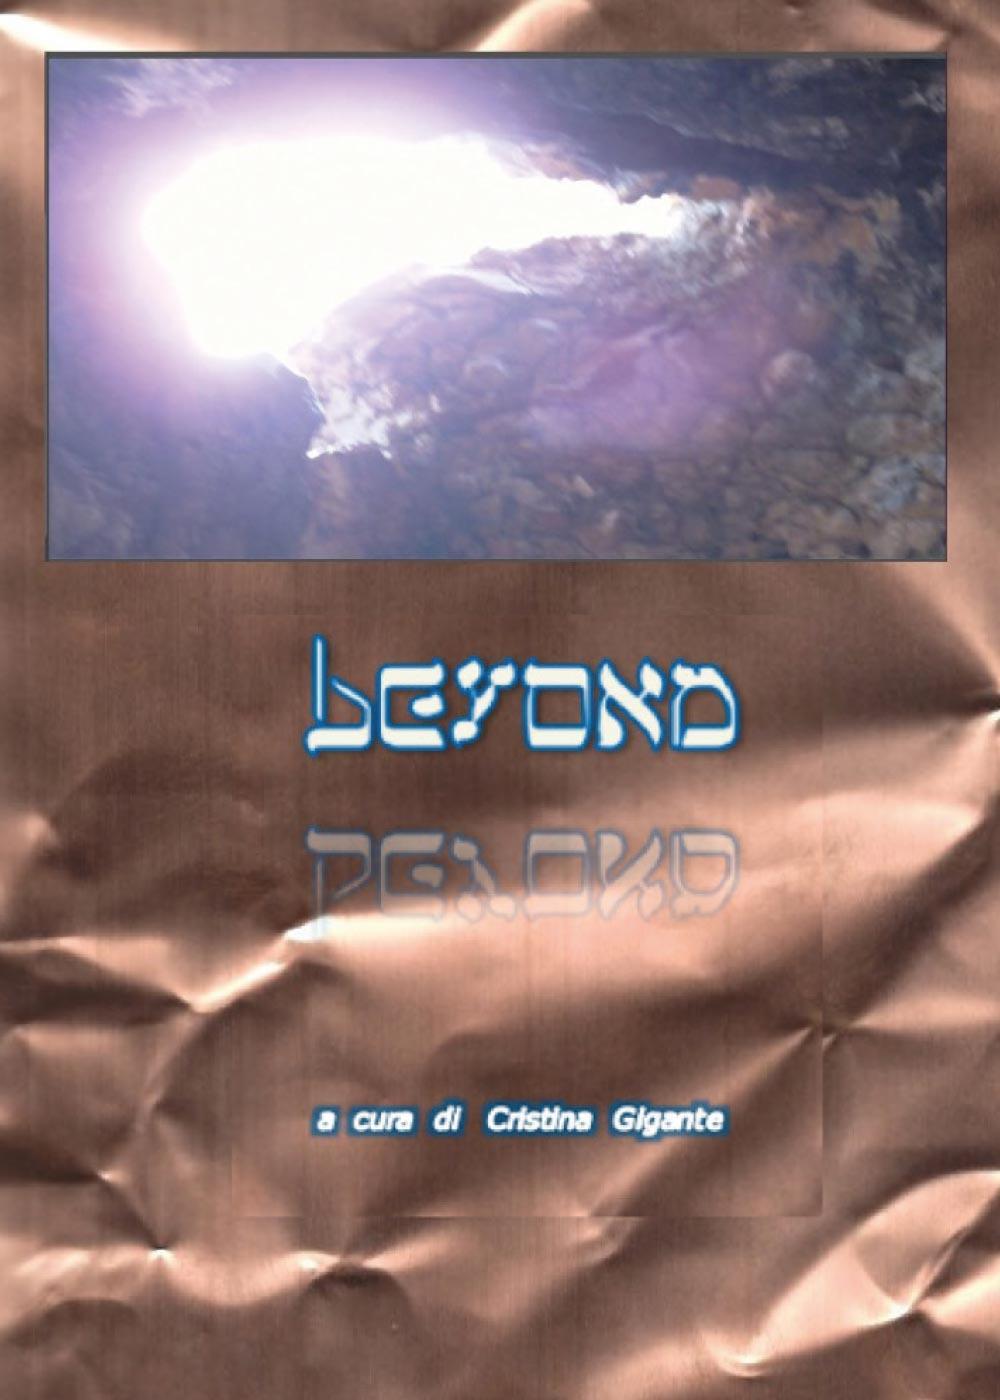 BEYOND (versione cartonata)